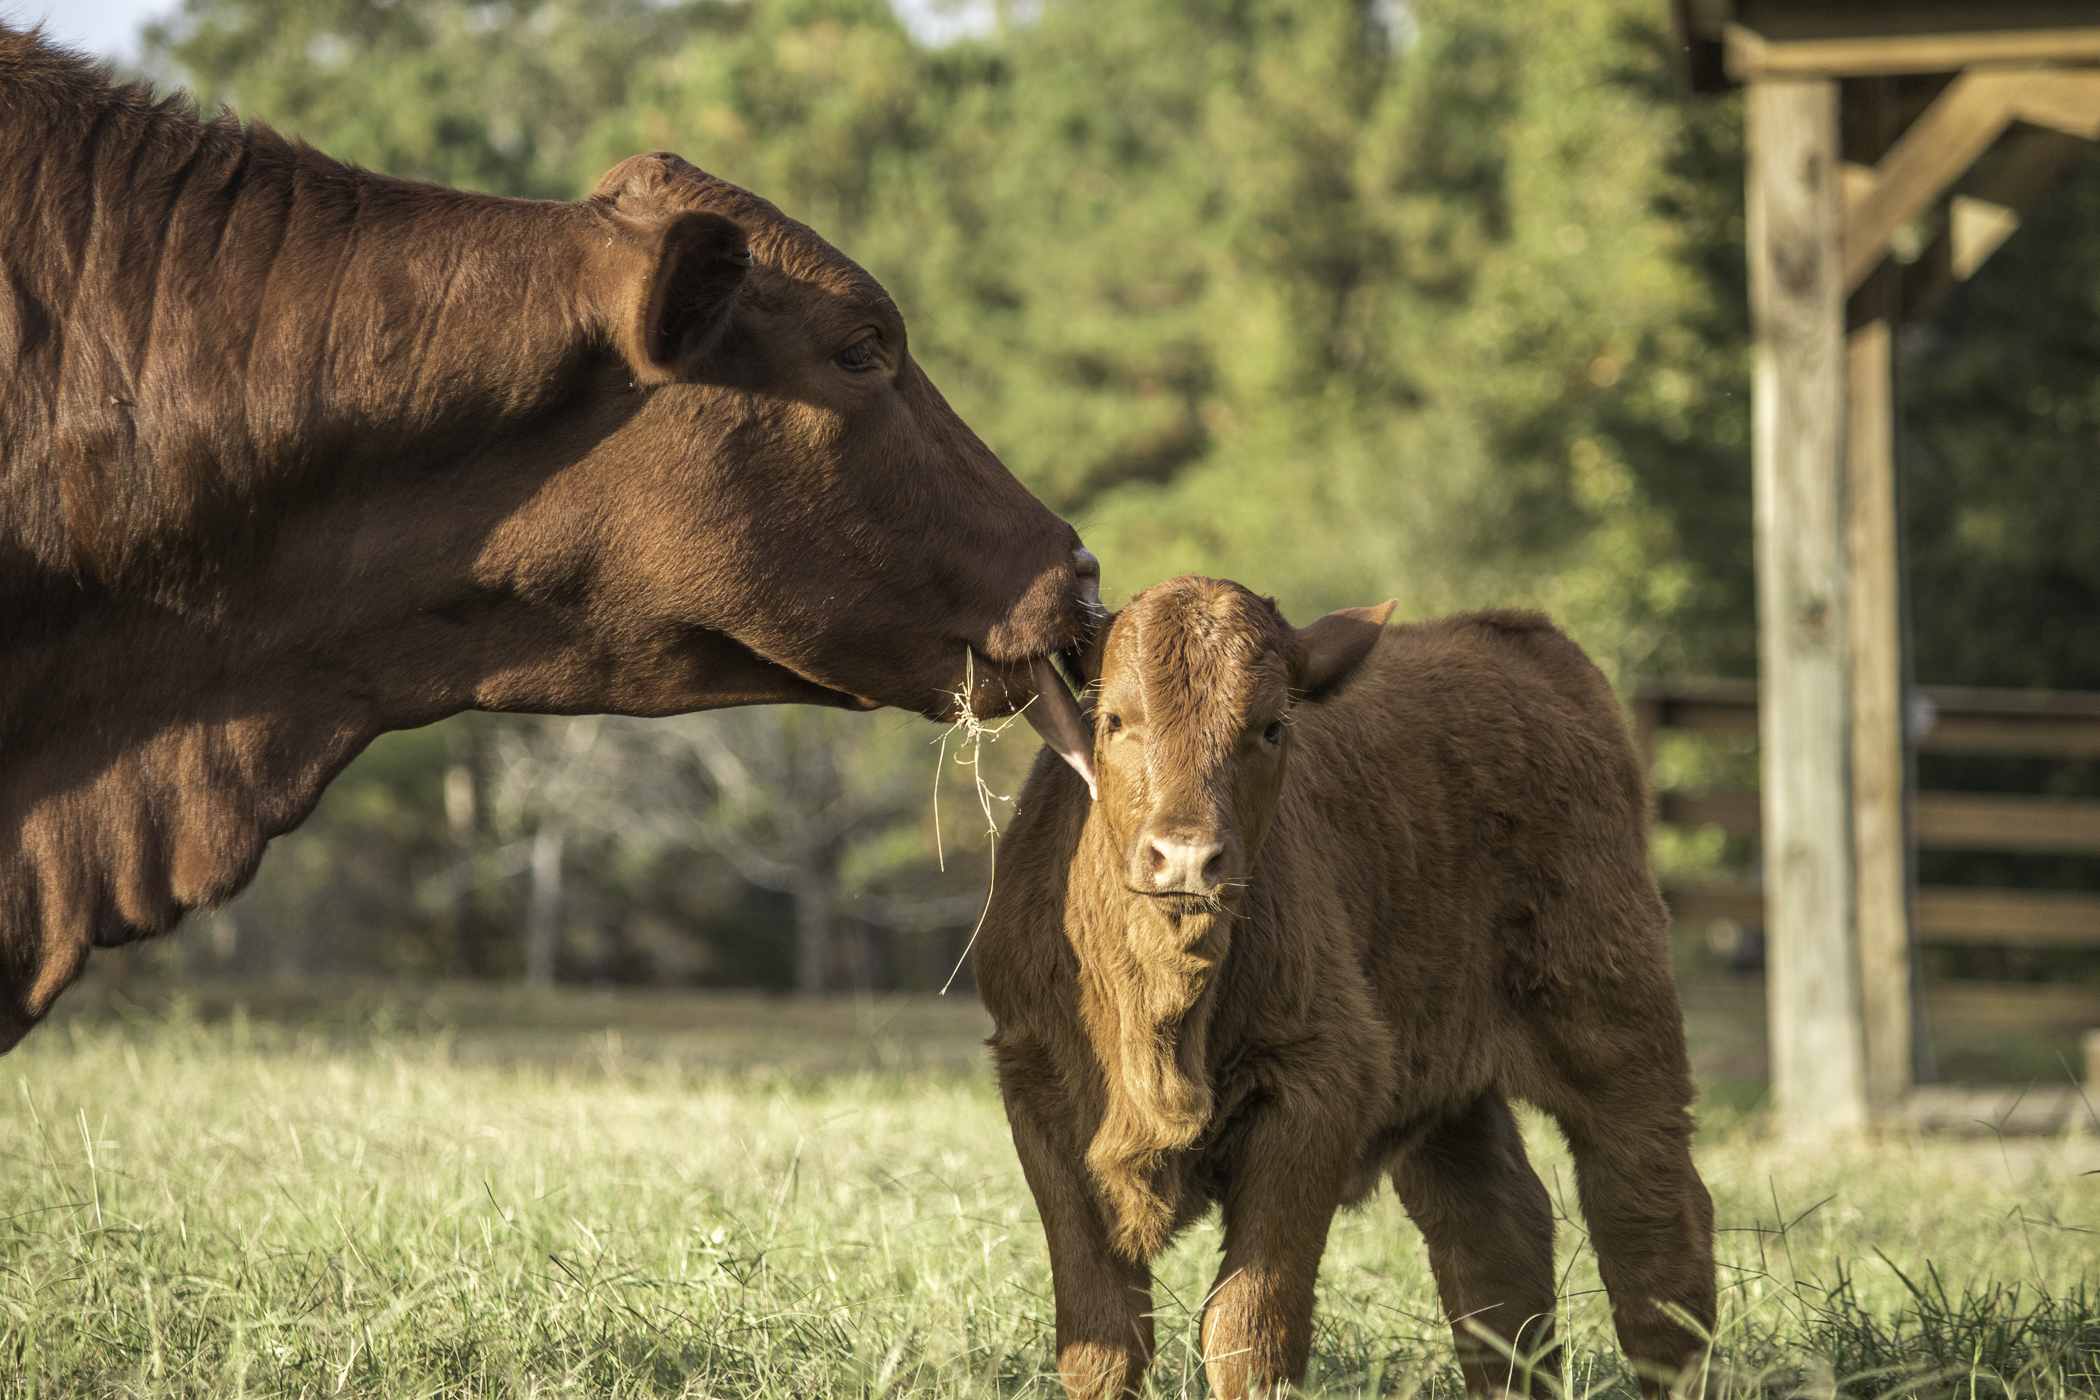 Cows-3-3.jpg